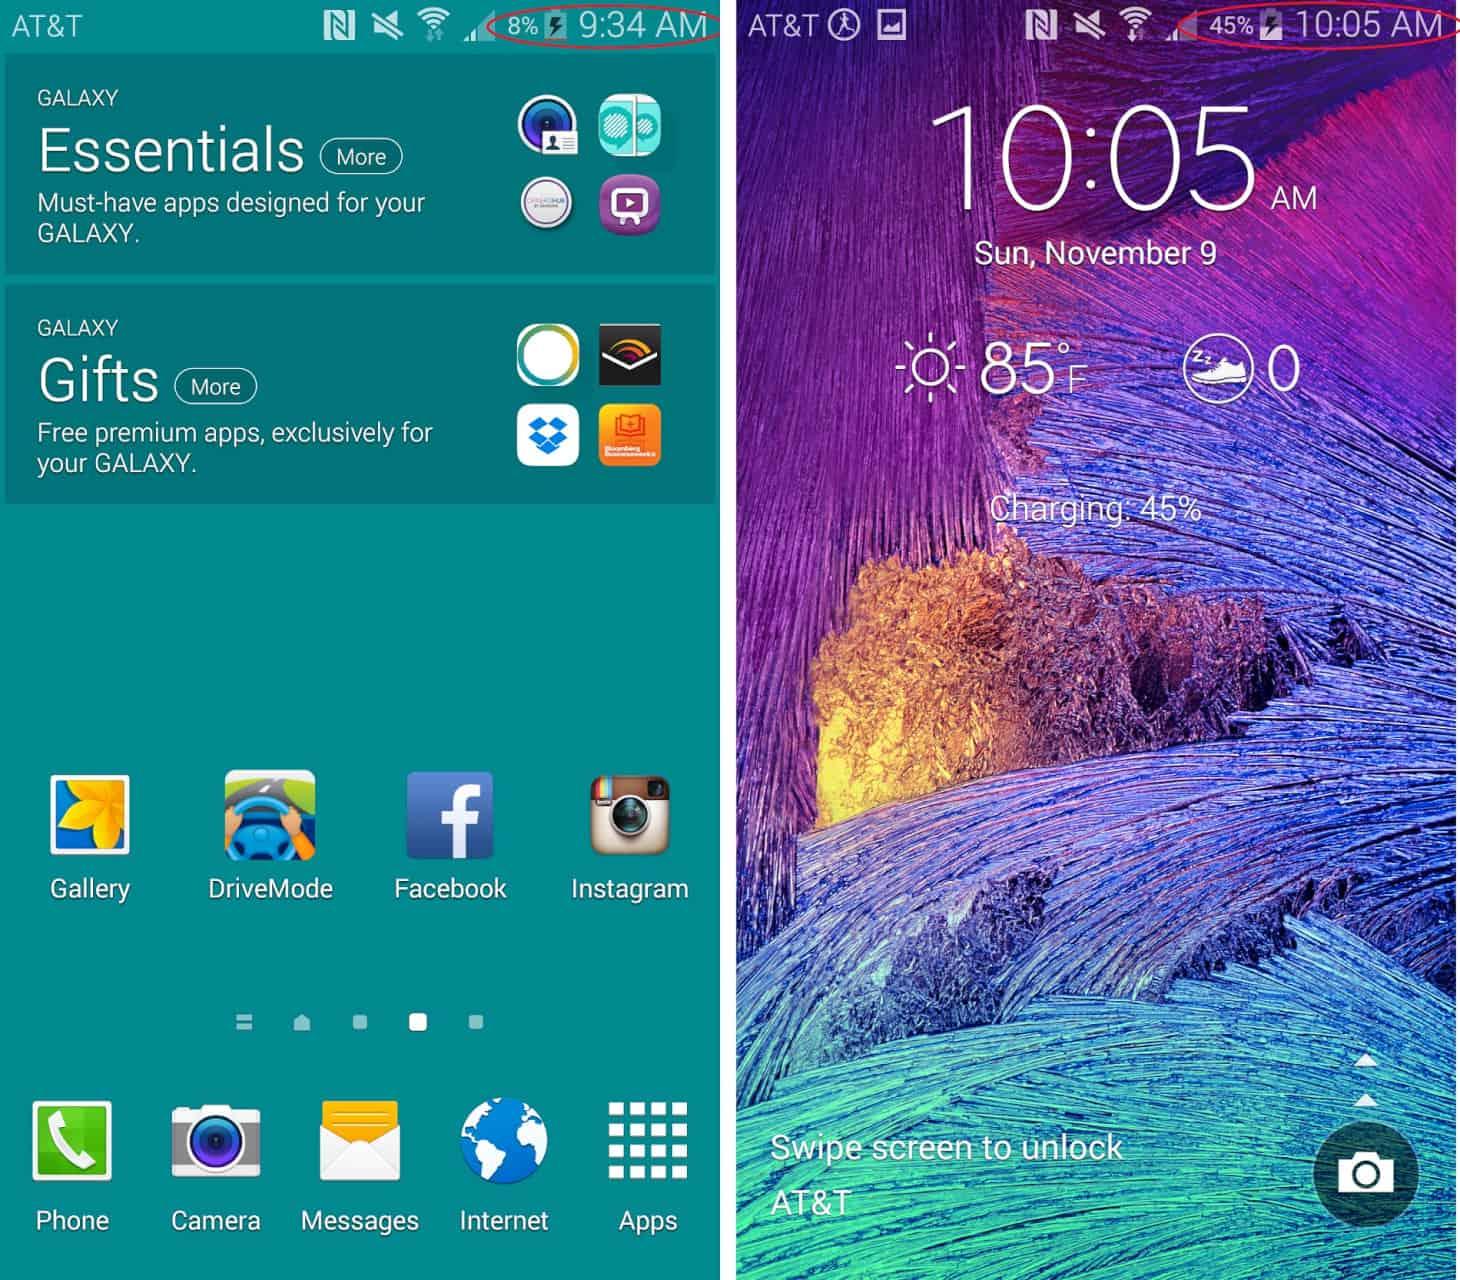 Samsung Note 4 Screenshots-3